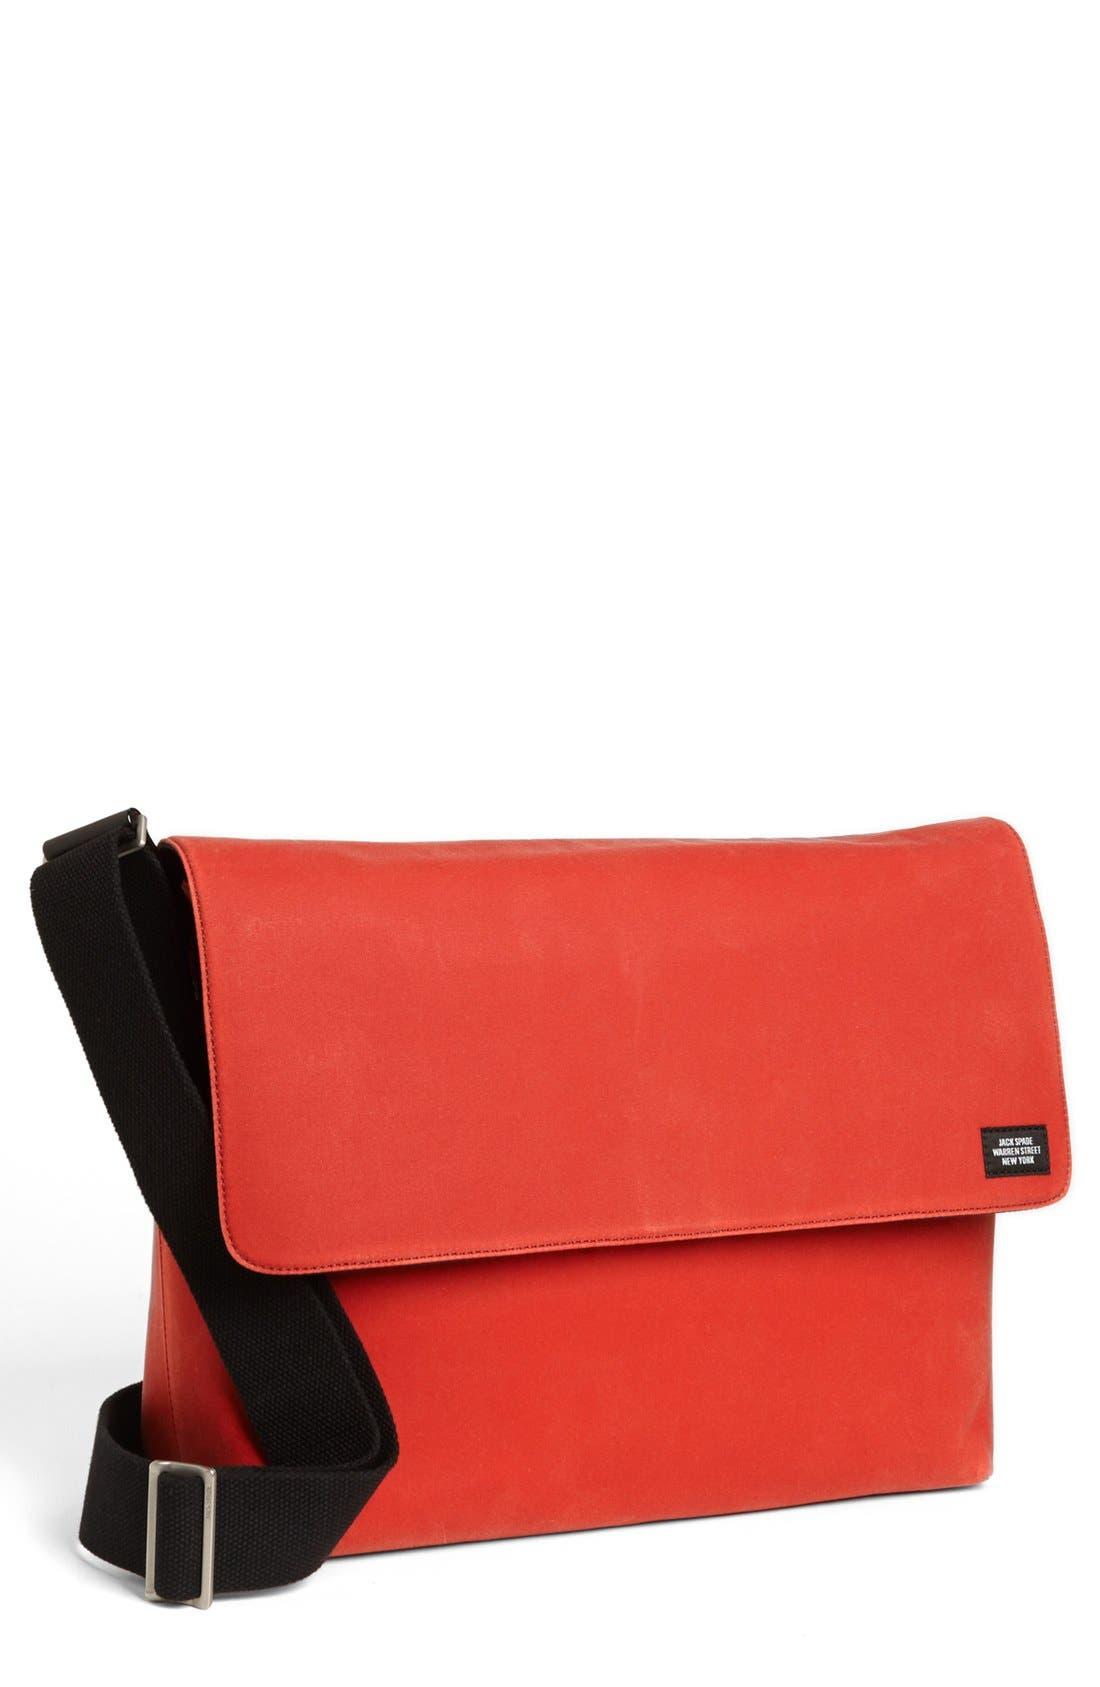 Main Image - Jack Spade 'Waxwear' Laptop Field Bag